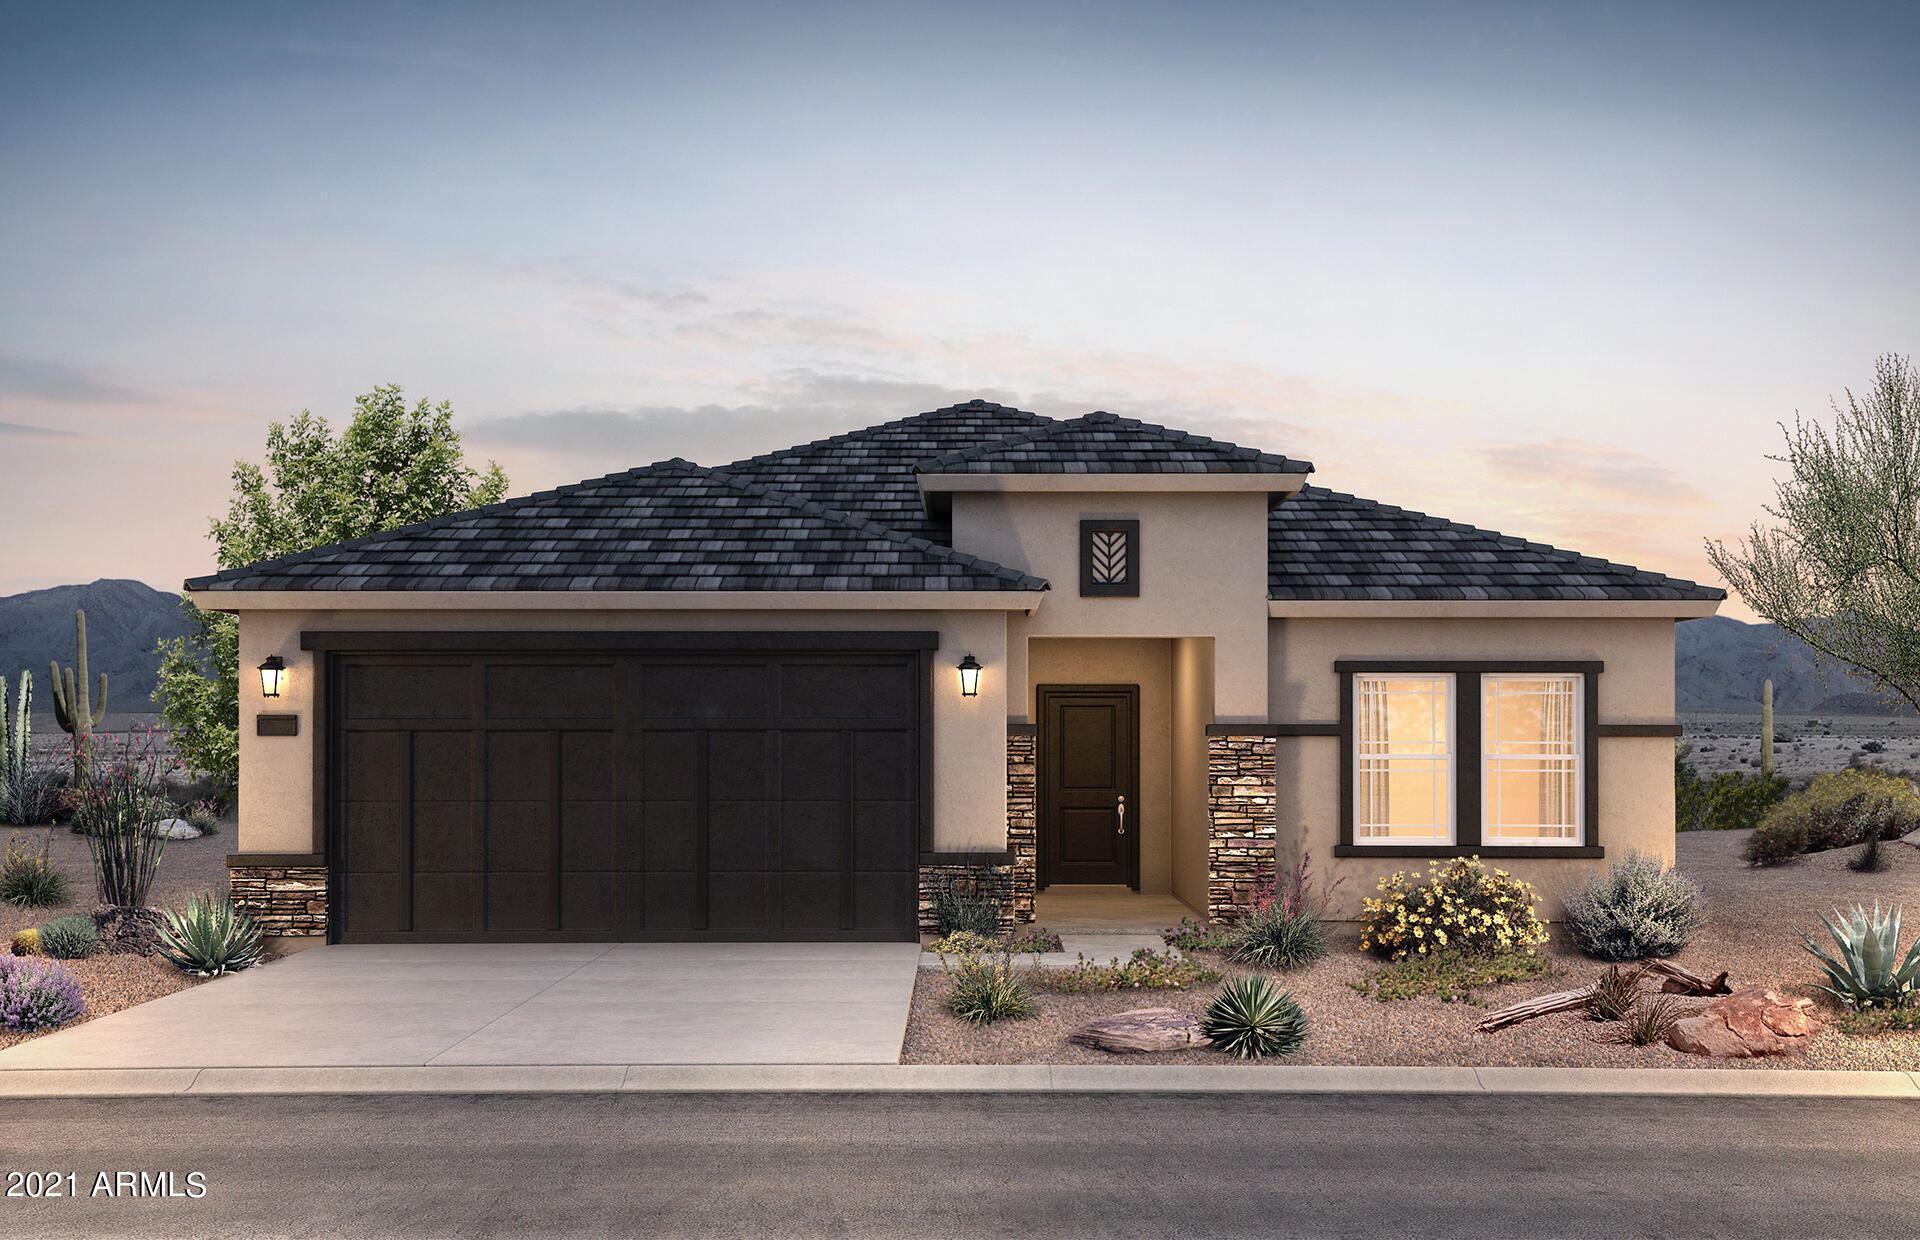 Photo for 43684 W MESCAL Drive, Maricopa, AZ 85138 (MLS # 6290539)